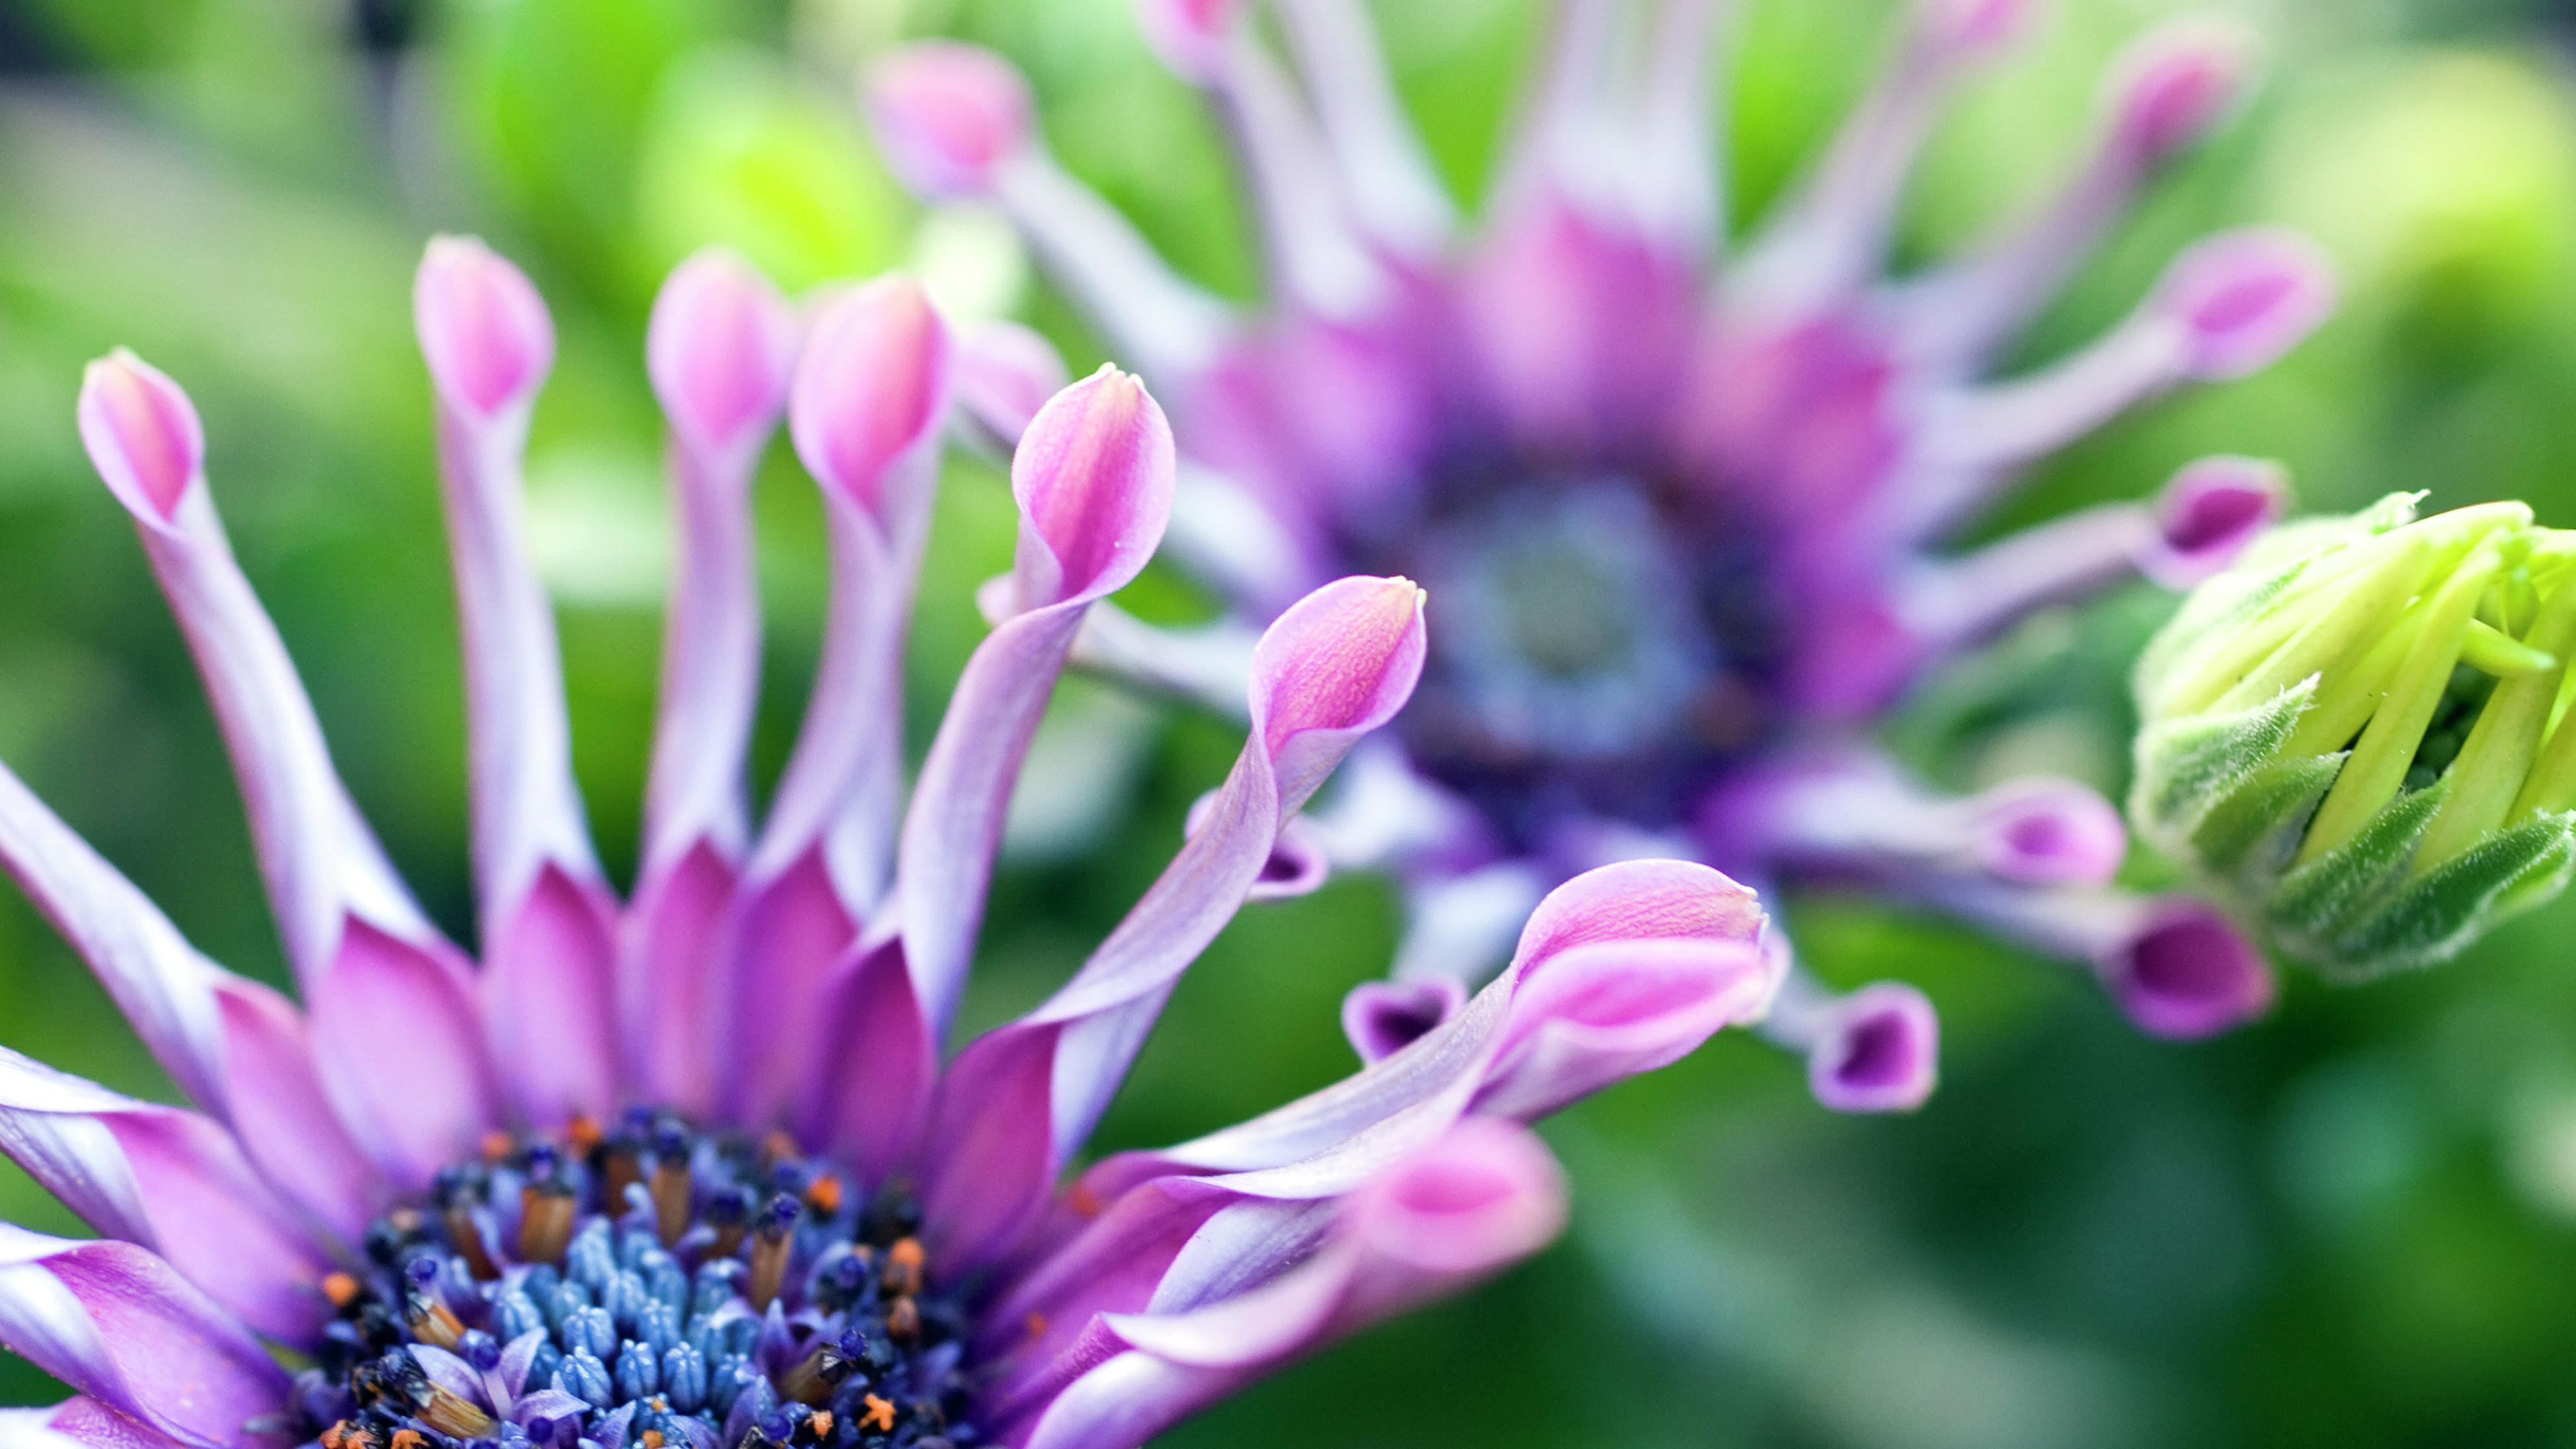 macro image of a purple osteospermum daisy